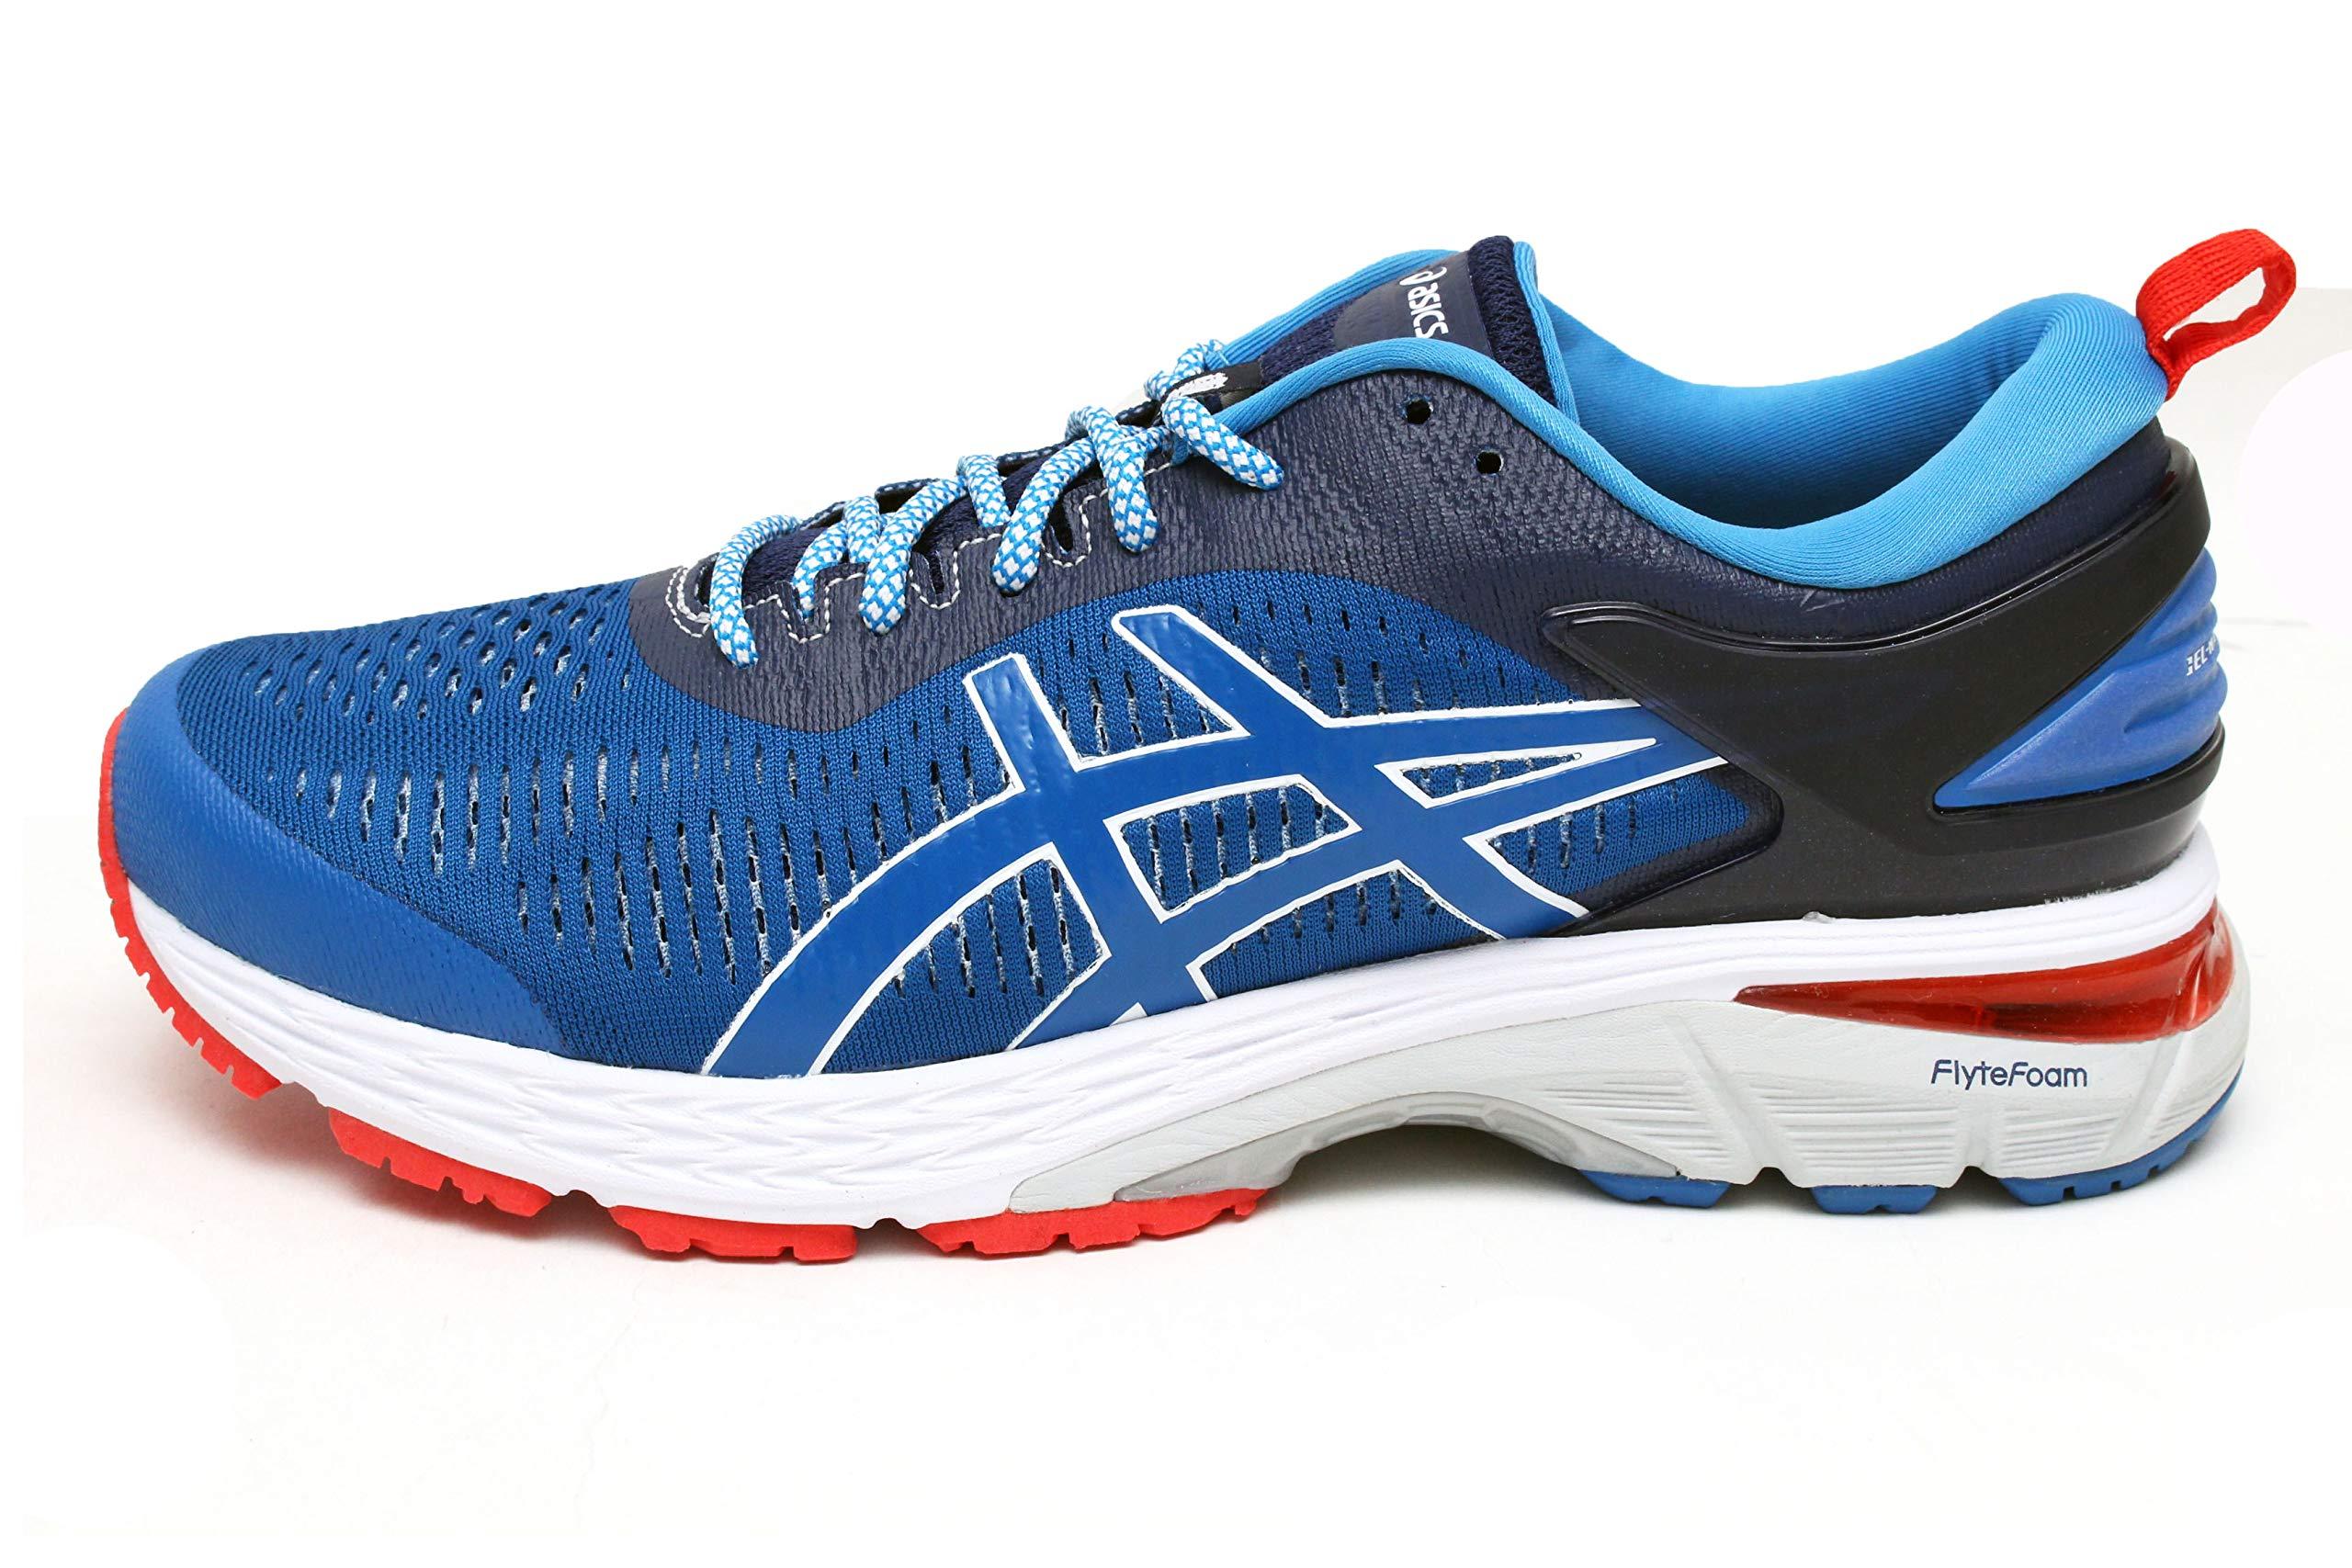 ASICS Women's Gel-Kayano 25 Running Shoe (6.5 B(M) US, Indigo Blue/Directoire Blue)